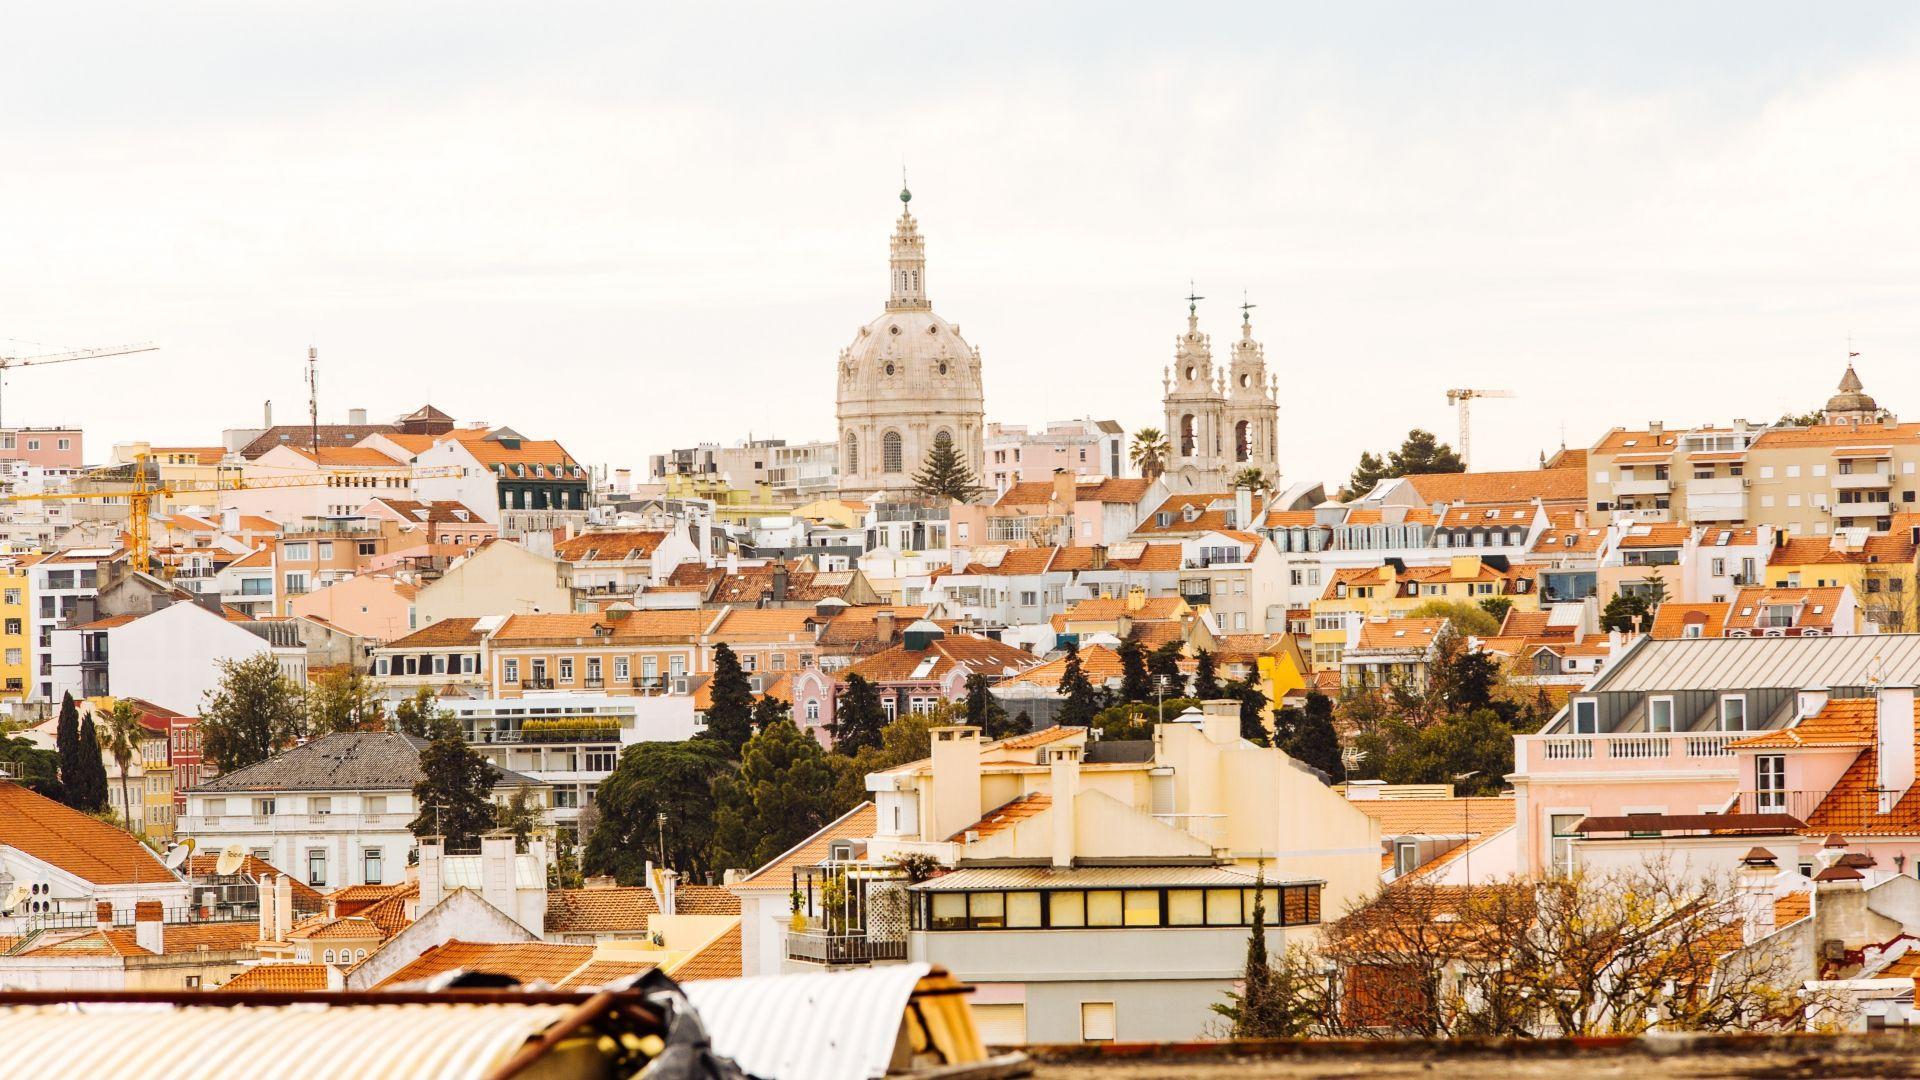 Lisabonos senamiestis